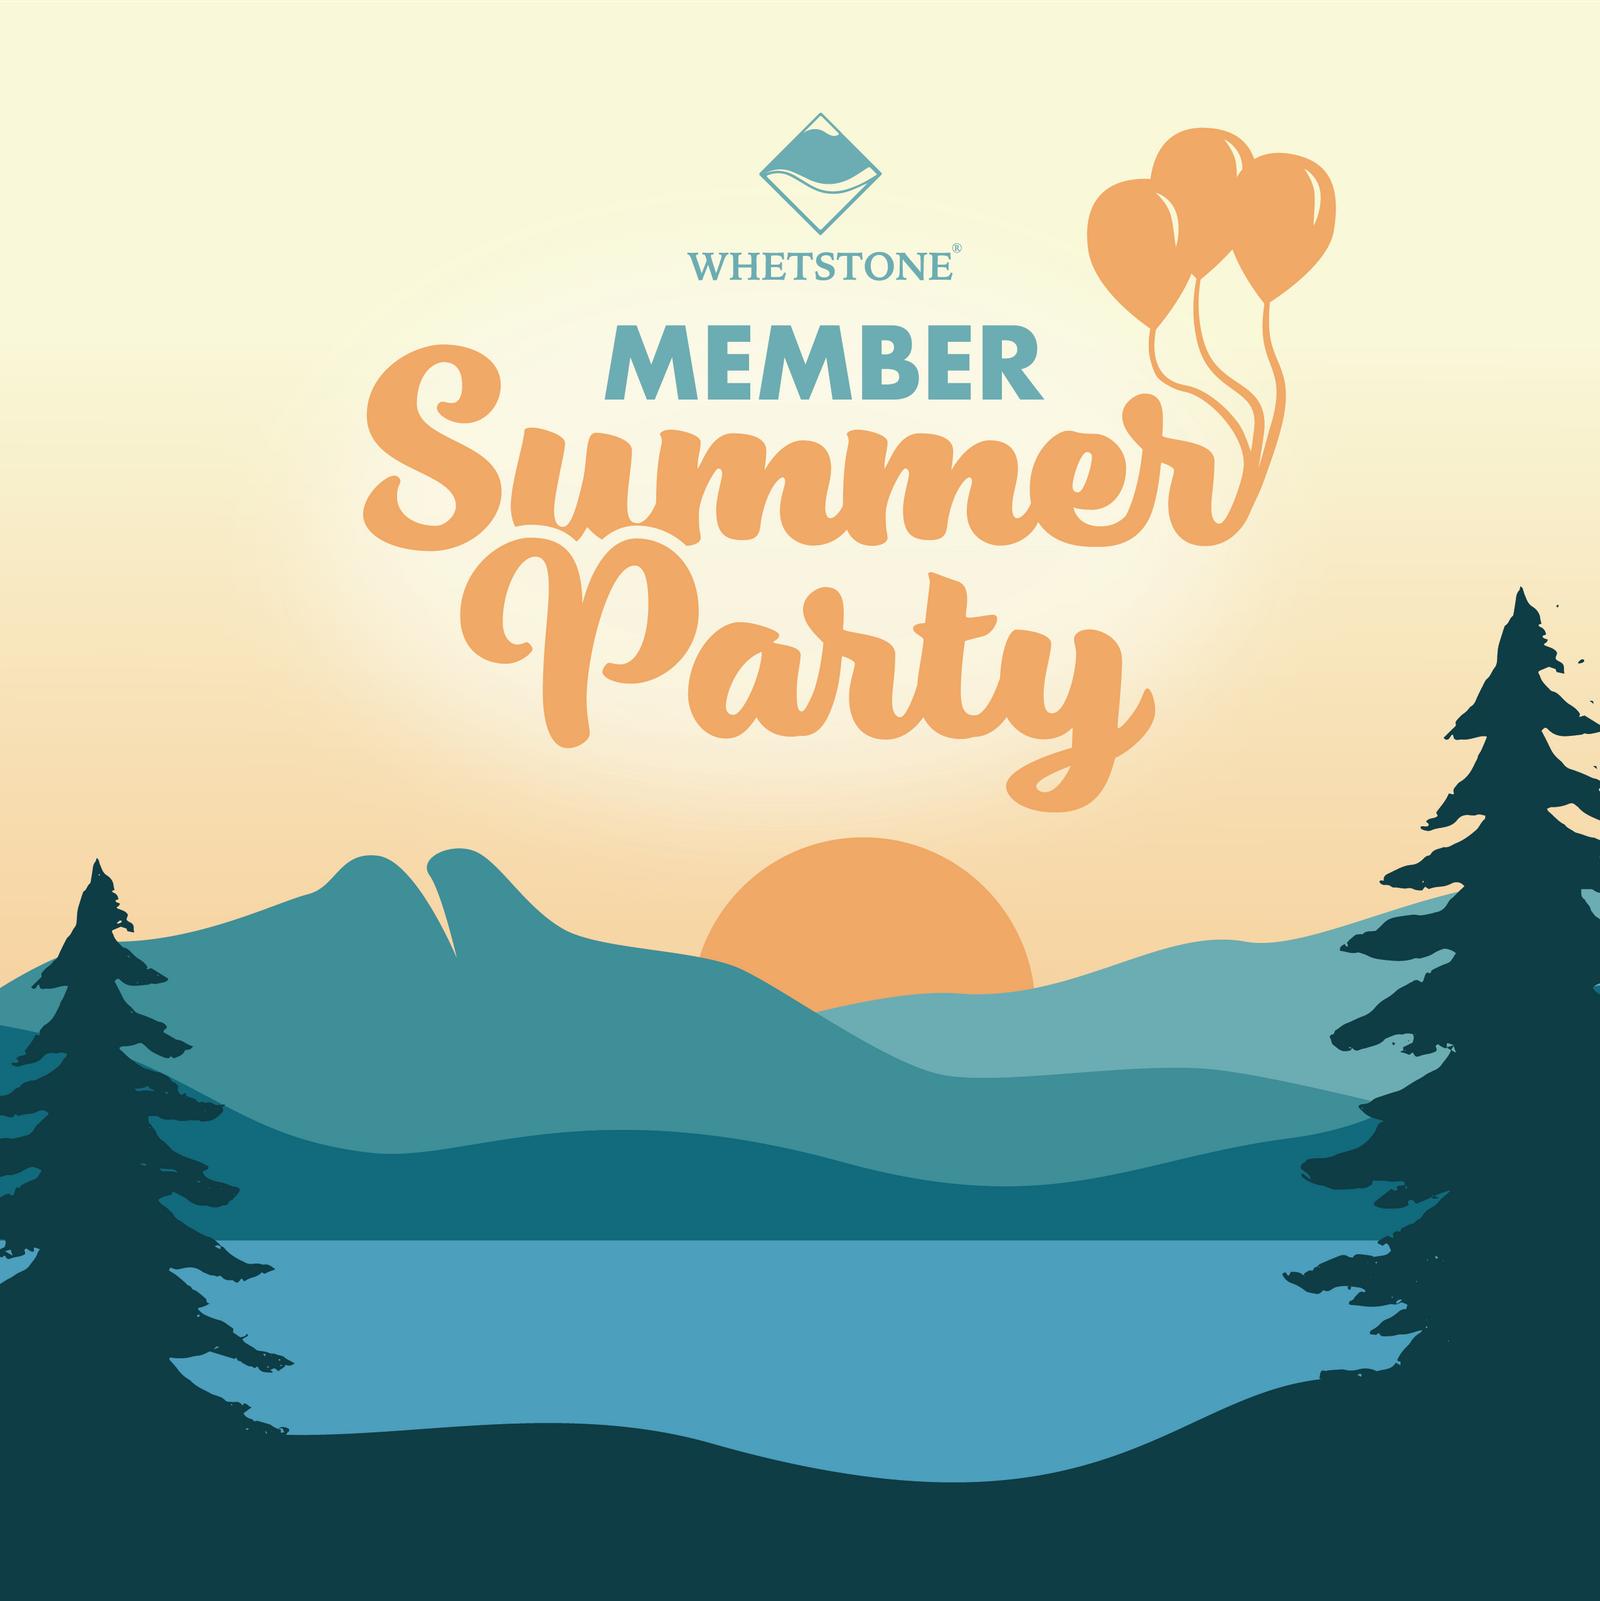 MemberSummerParty-02.png